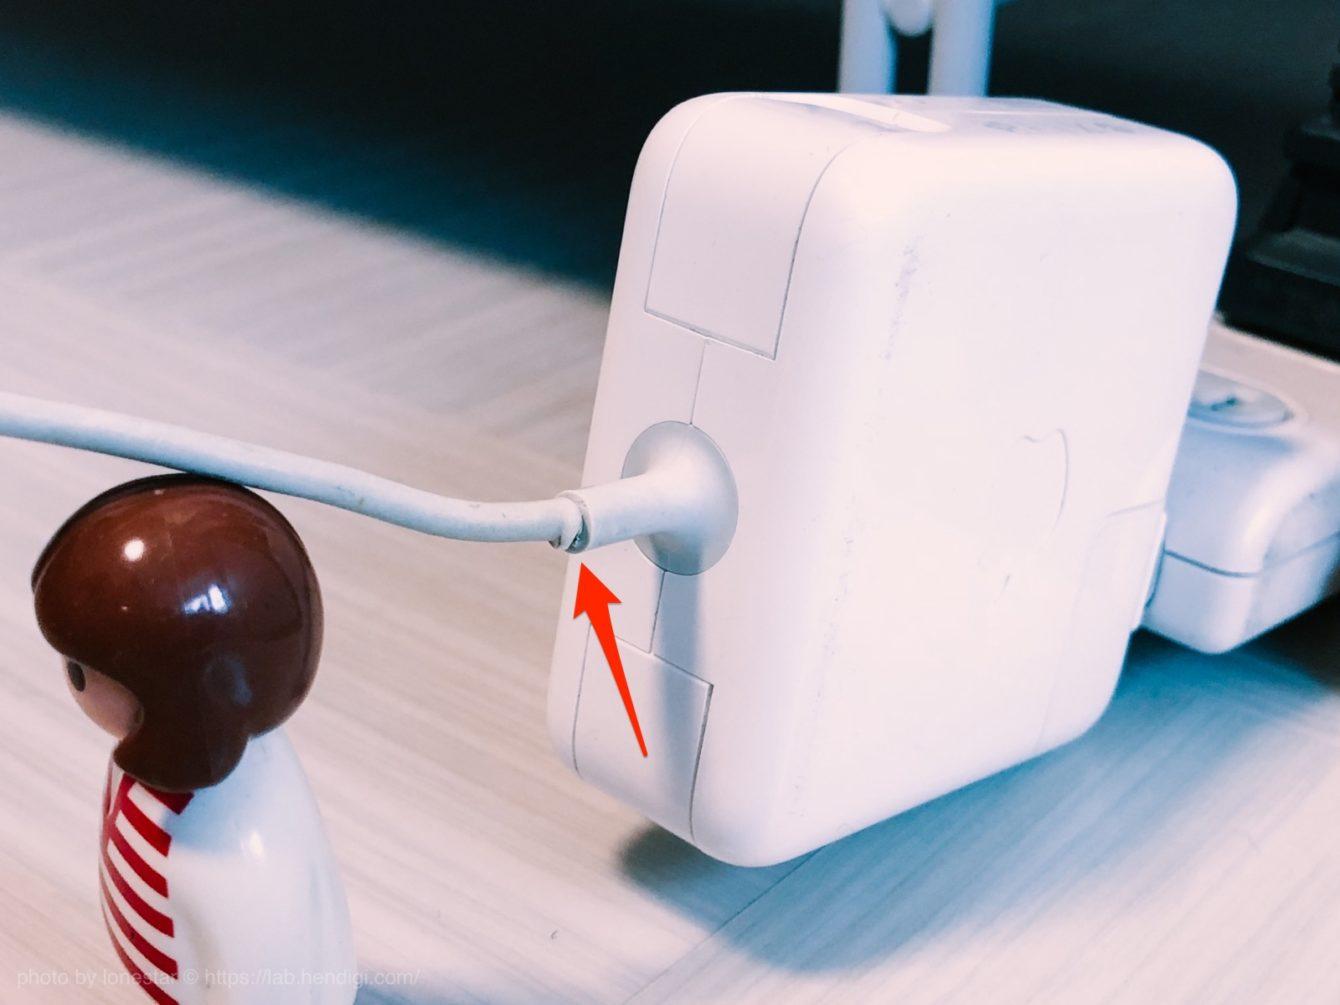 MacBook Air 電源アダプタ